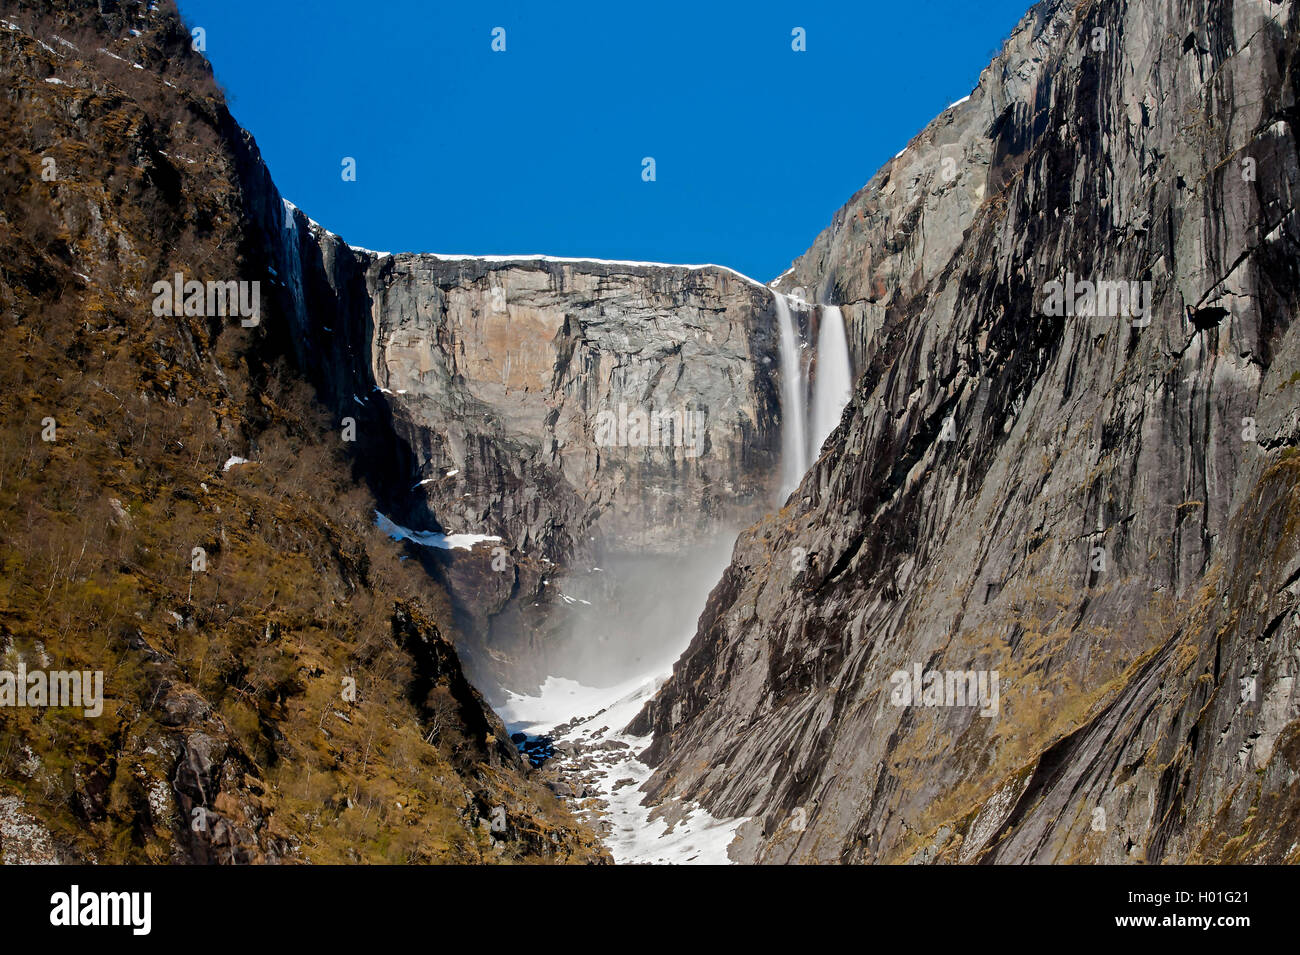 Wasserfall Vedalsfossen, Norwegen, Hordaland, Eidfjord, Hjolma | waterfall Vedalsfossen, Norway, Hordaland, Eidfjord, Hjolma | B Stock Photo